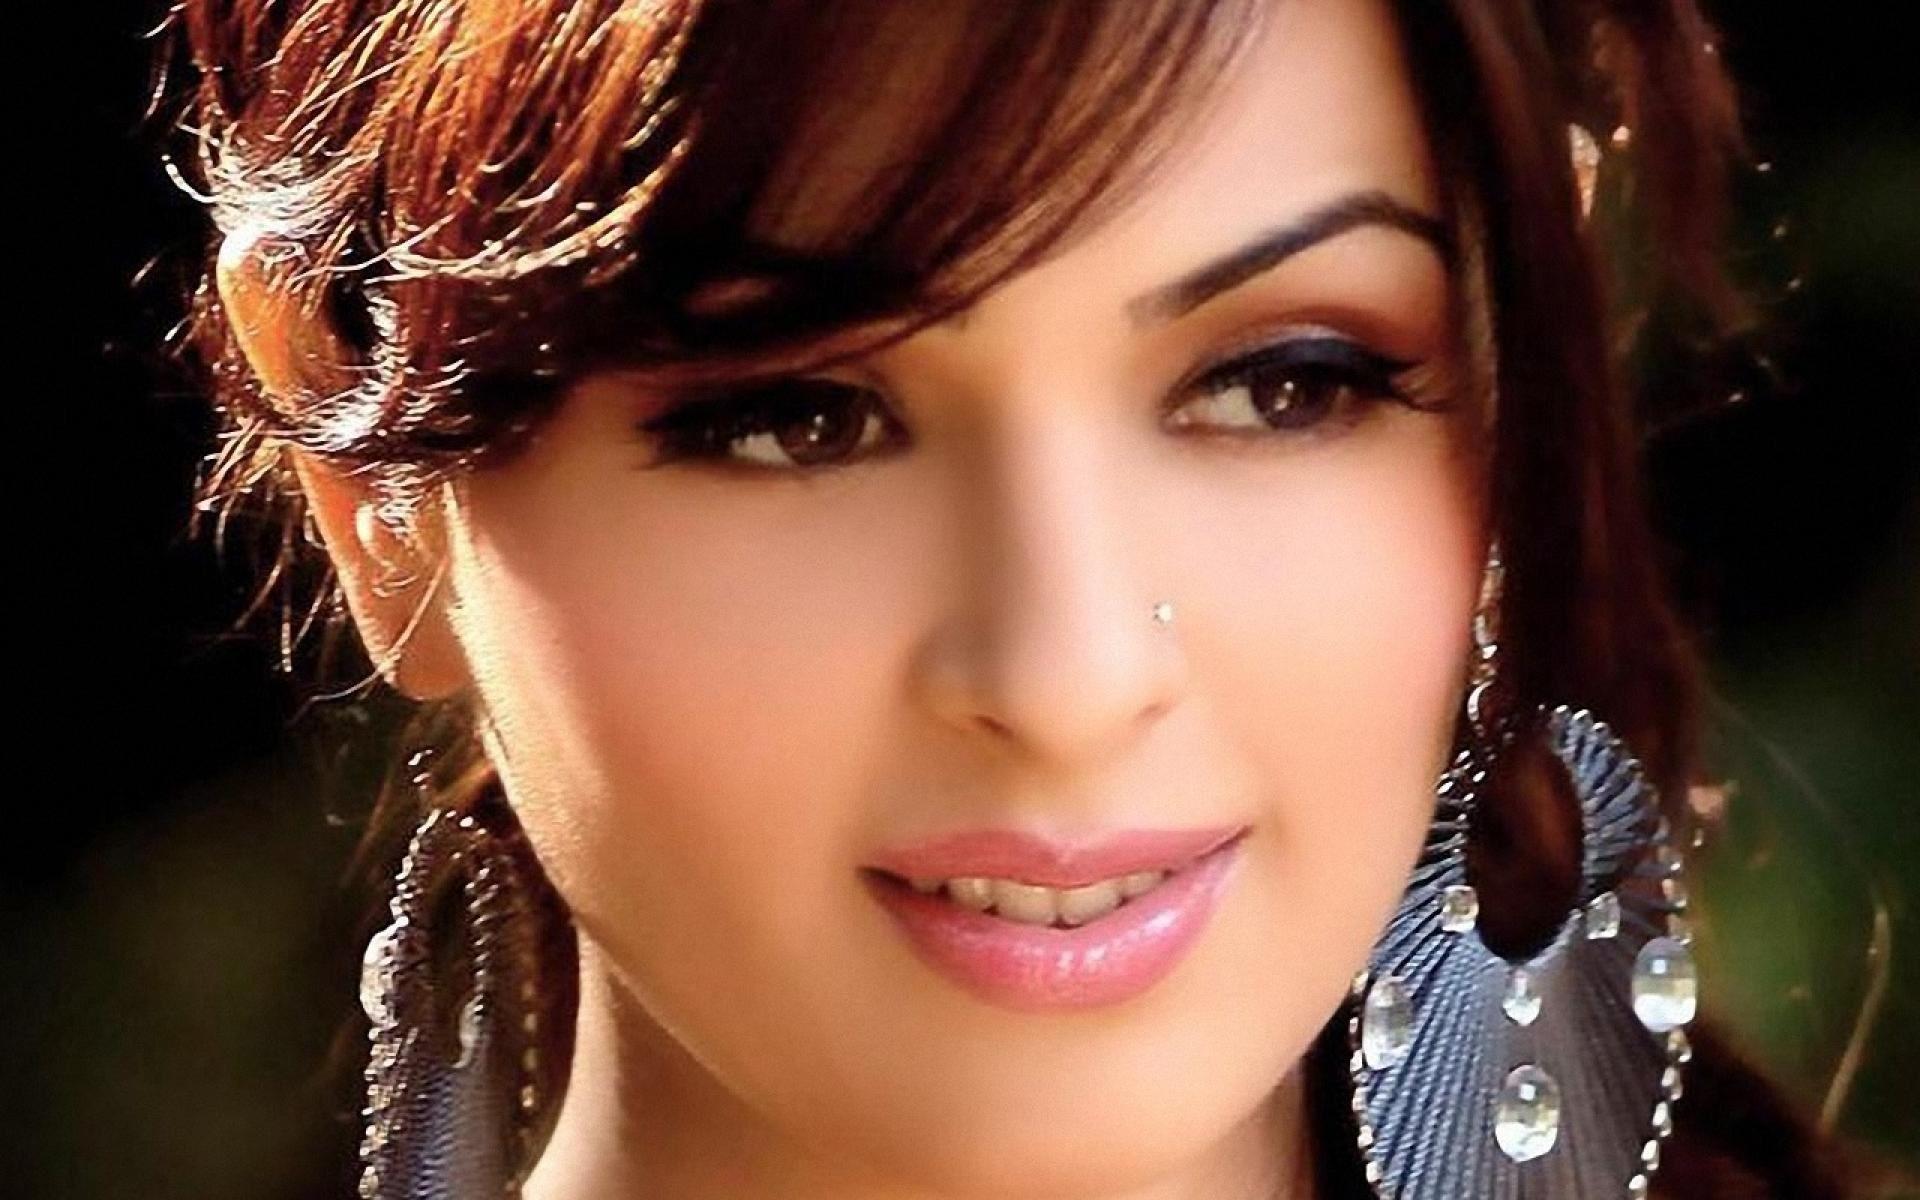 Bollywood Actress Wallpapers Hd Wallpapers Backgrounds Of Bollywood Image Wallpapers Wallpapers